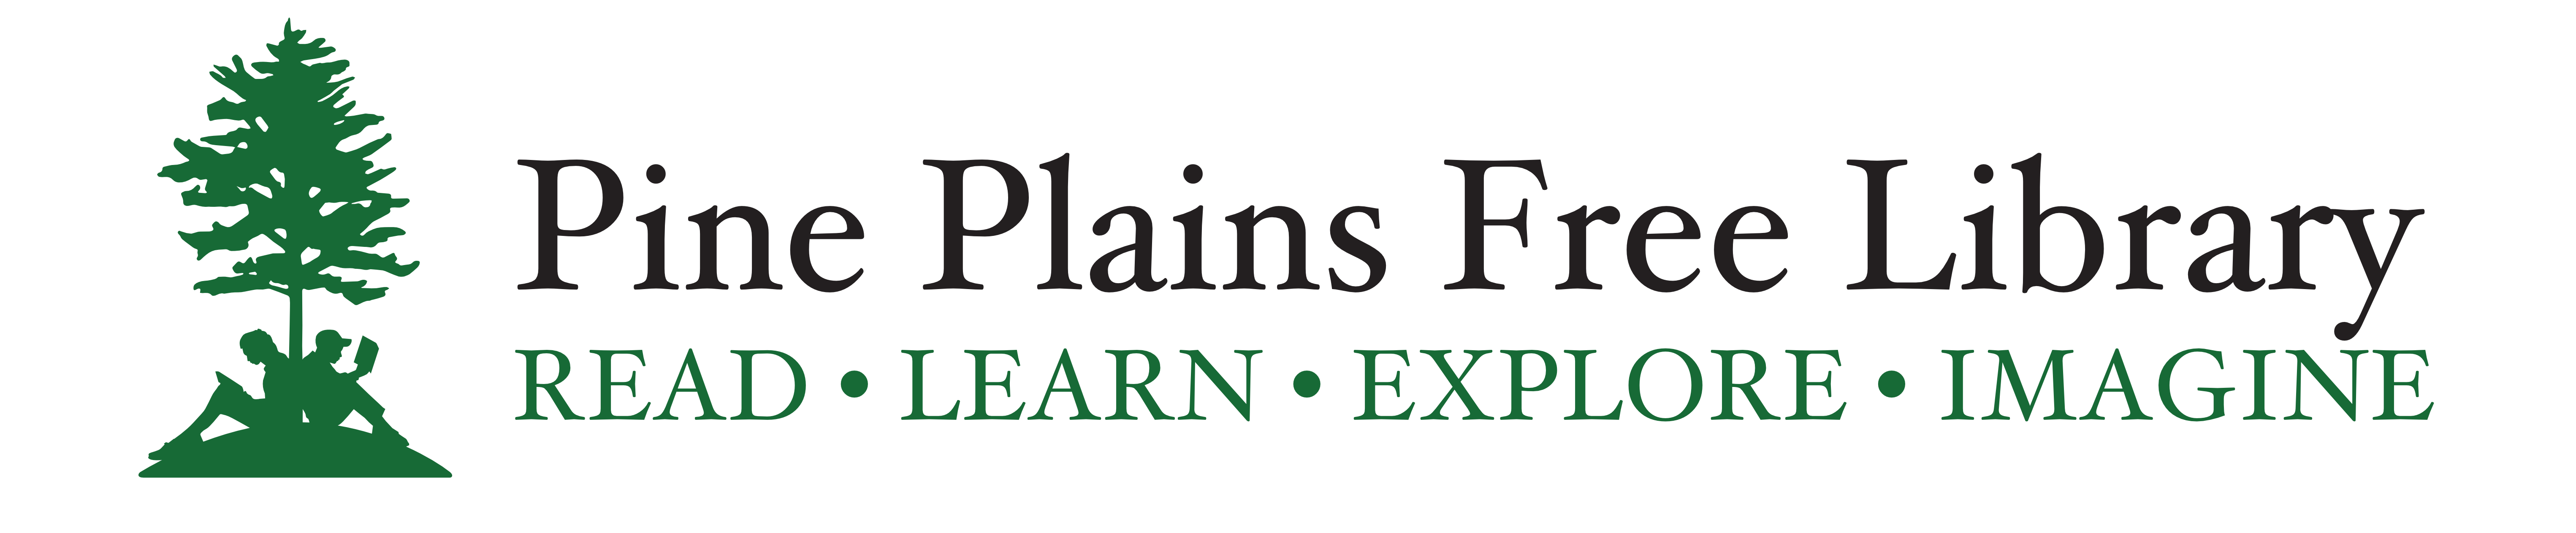 Pine Plains Free Library